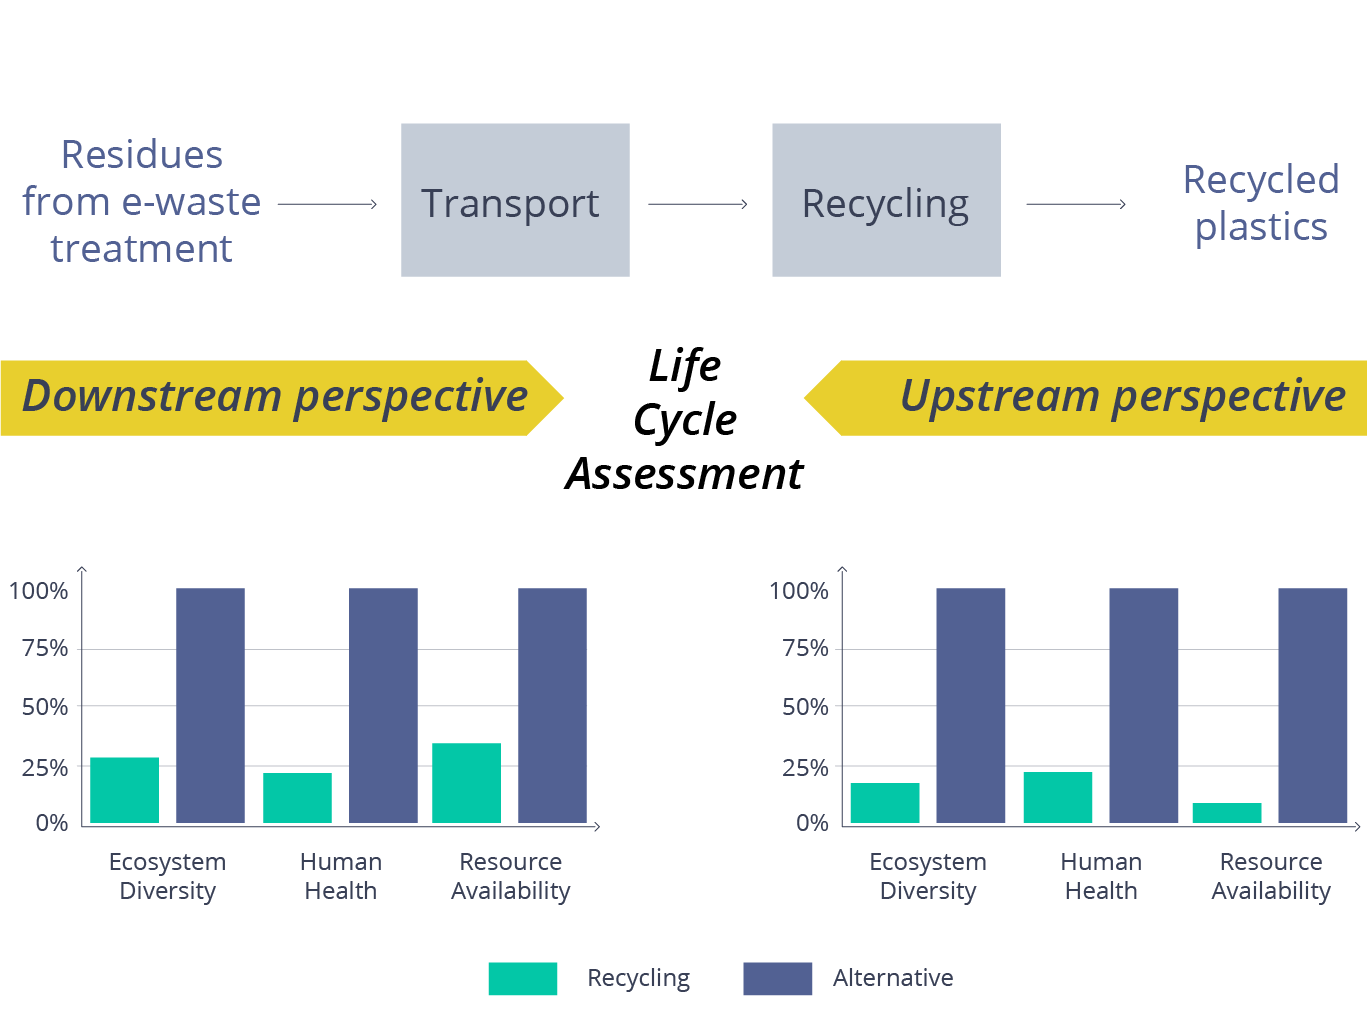 Representation of relative environmental impact of recycled plastic